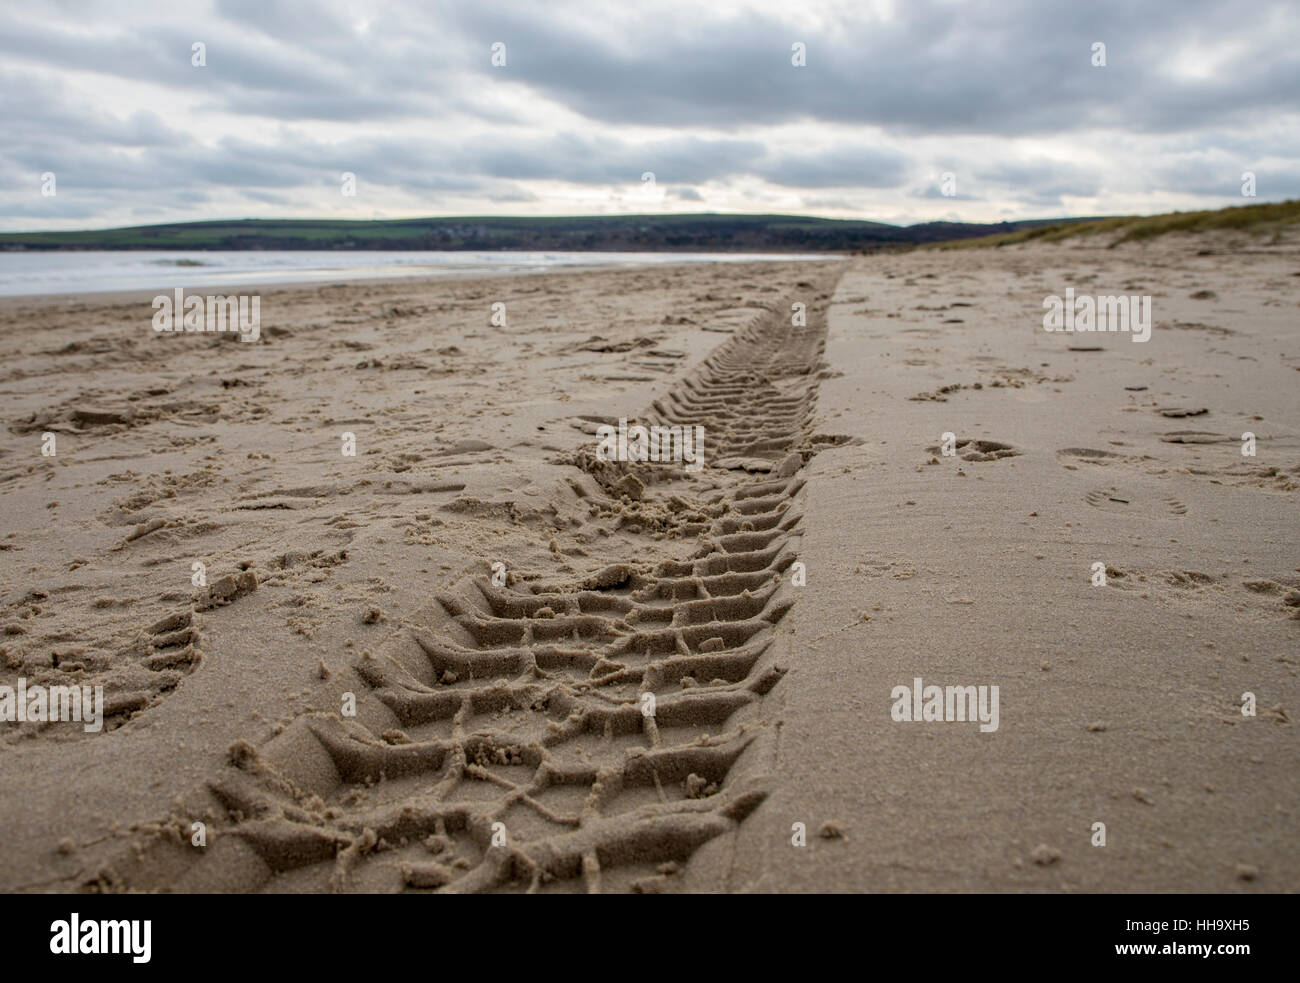 tyre mark tracks on sandy beach on grey day - Stock Image